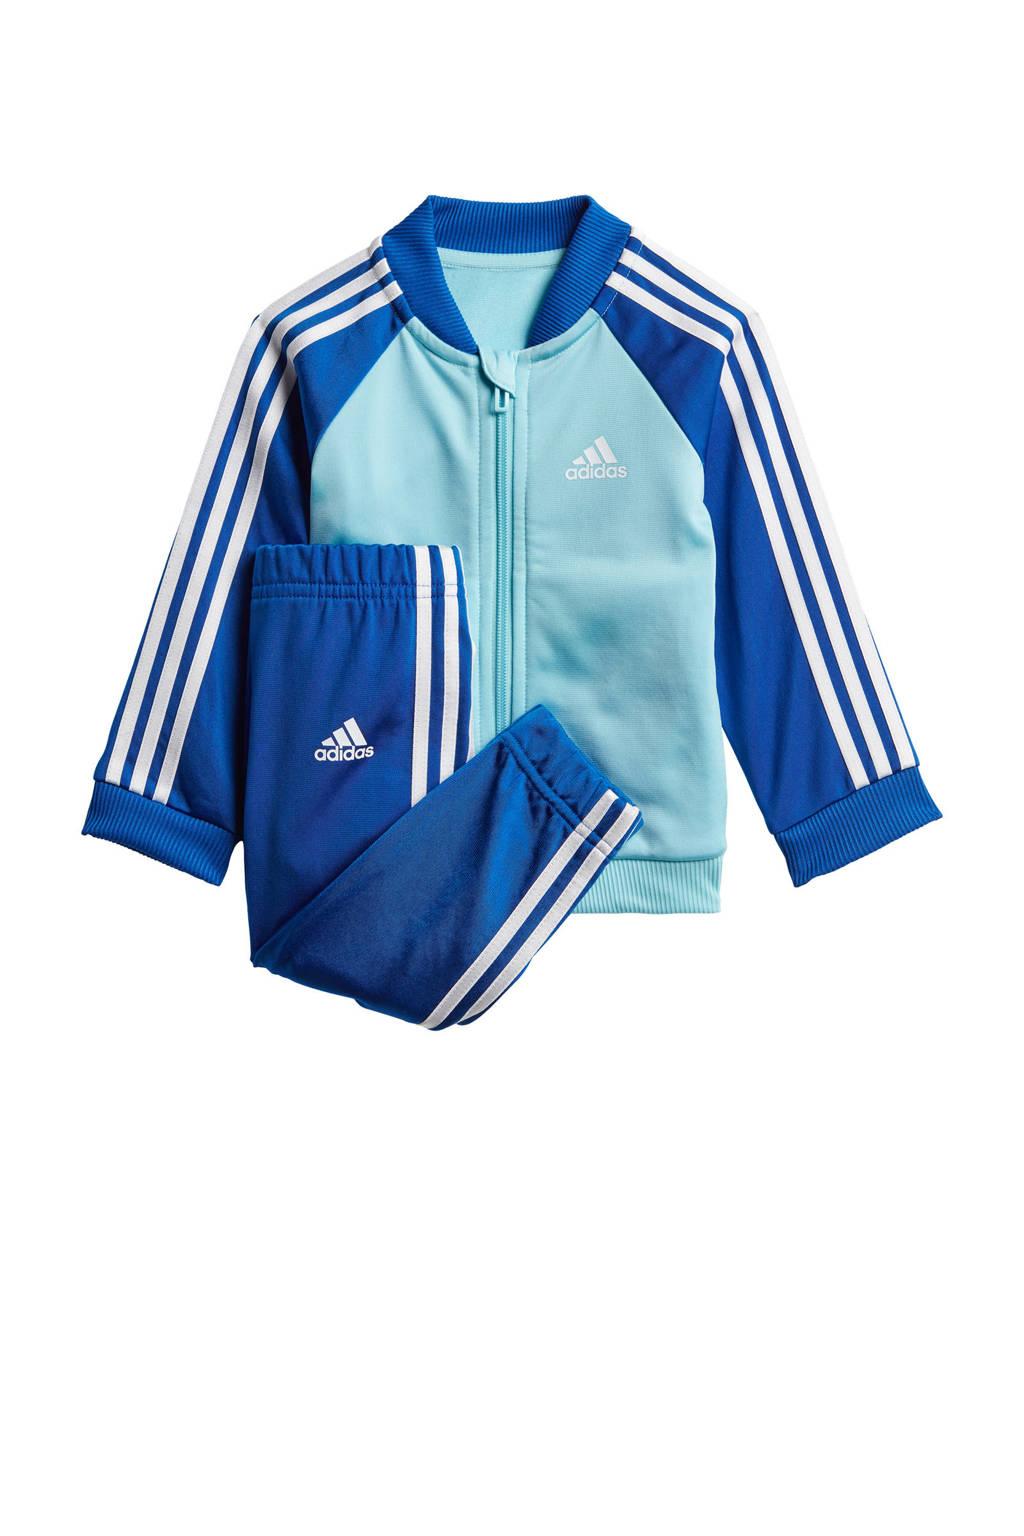 adidas Performance   trainingspak lichtblauw/wit/kobaltblauw